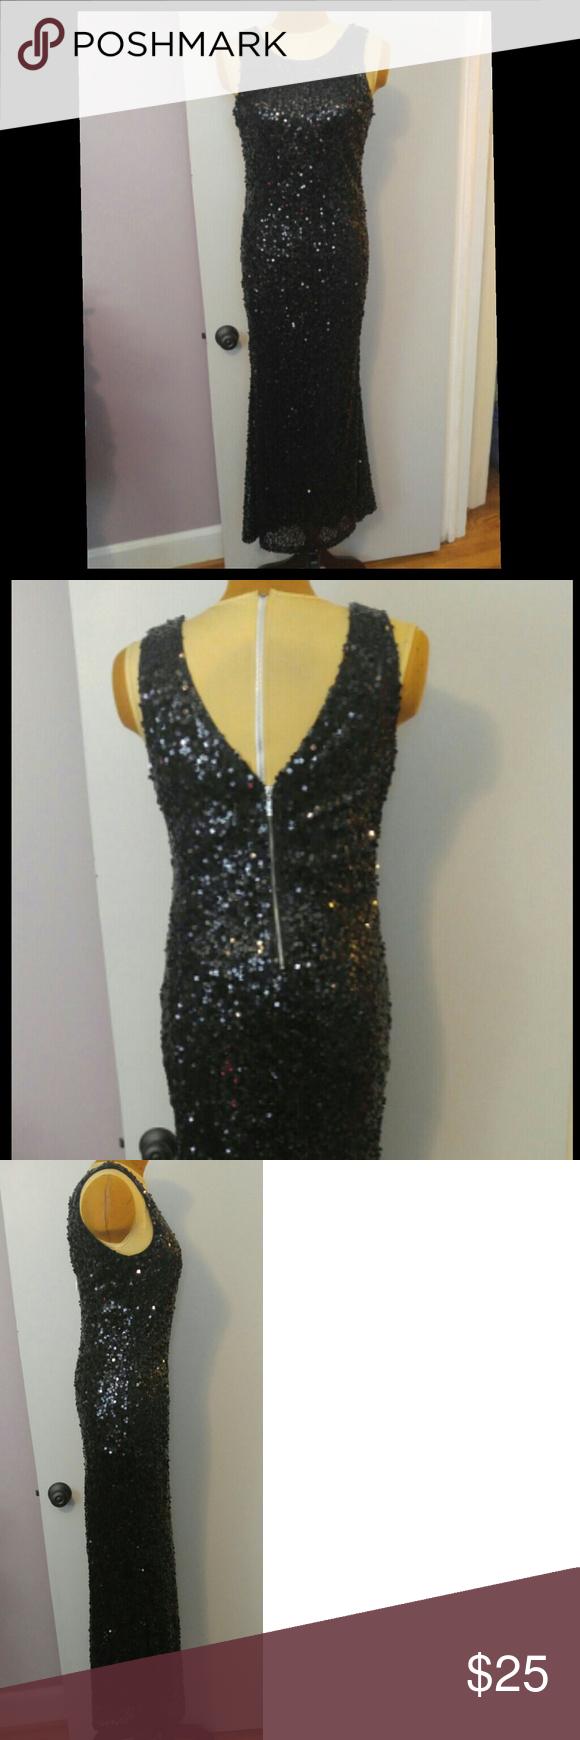 Nwt black sequin dress long black sequin dress black sequin dress